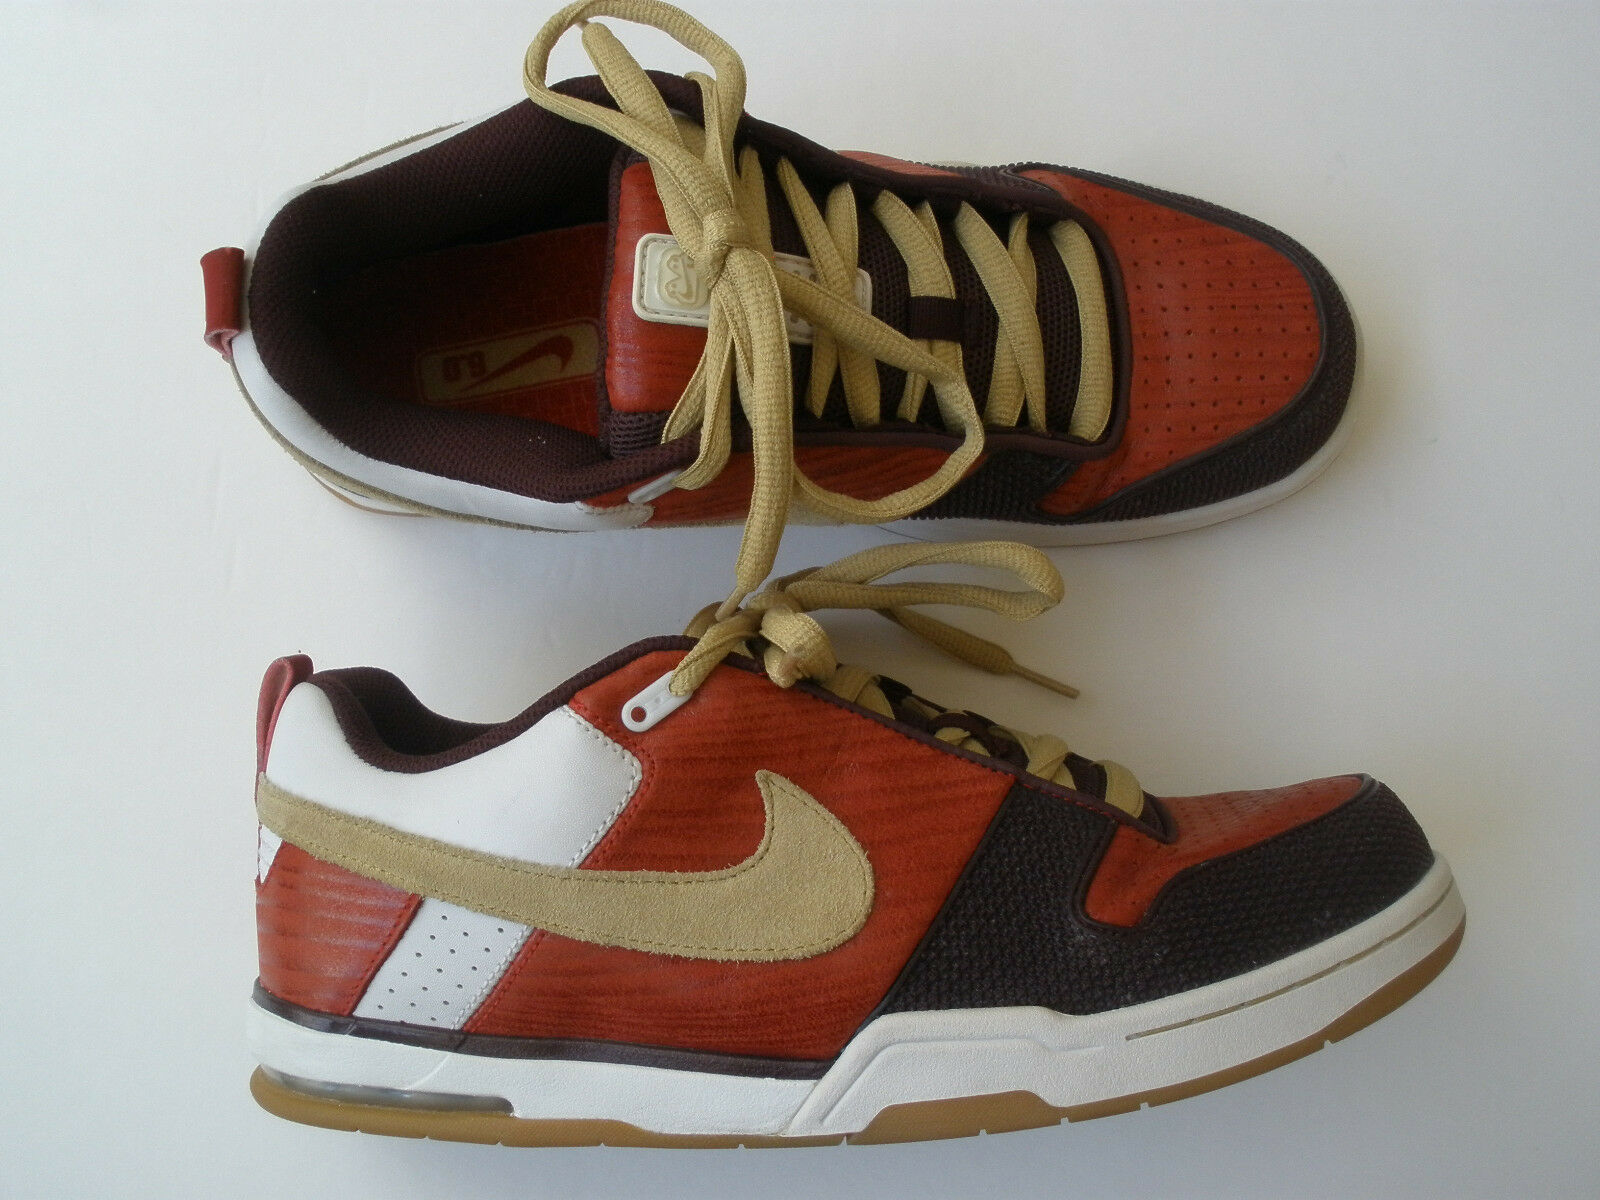 buy popular 6b3f1 3d022 2018 NIKE 6.0 rojo rojo rojo WOOD INSURGENT Cuero Zapatos EE. UU. 10.5 AIR